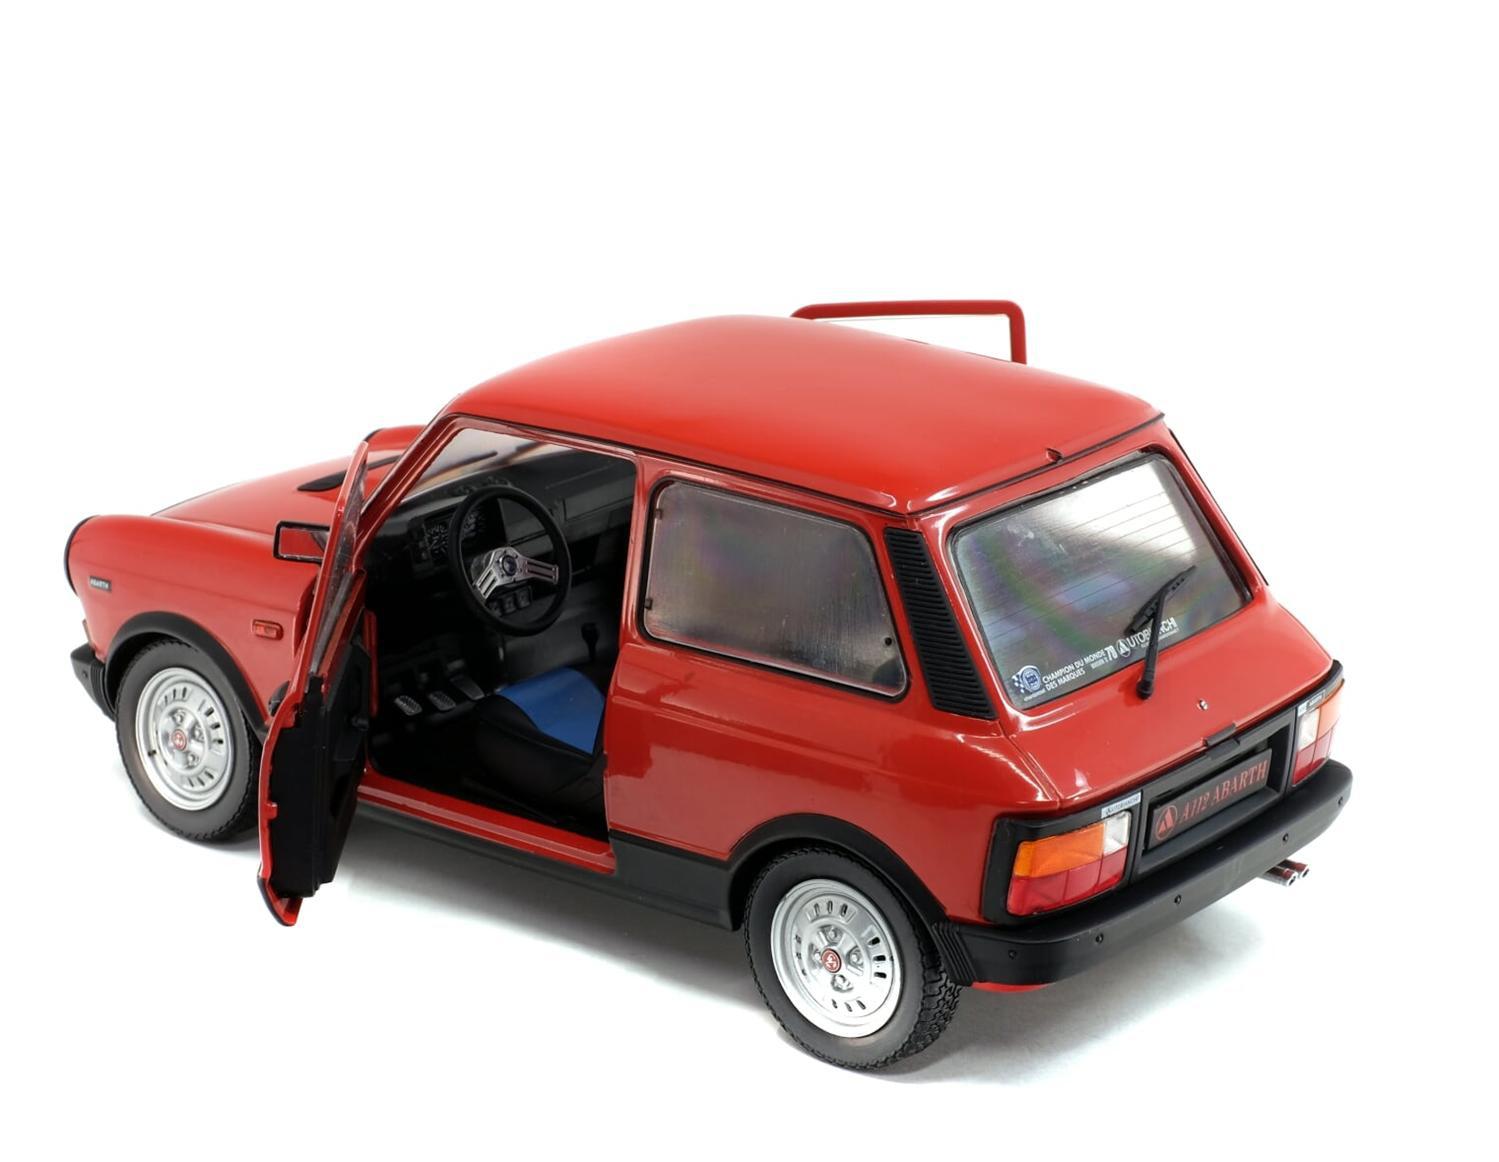 Autobianchi A112 MK Abarth Rallye